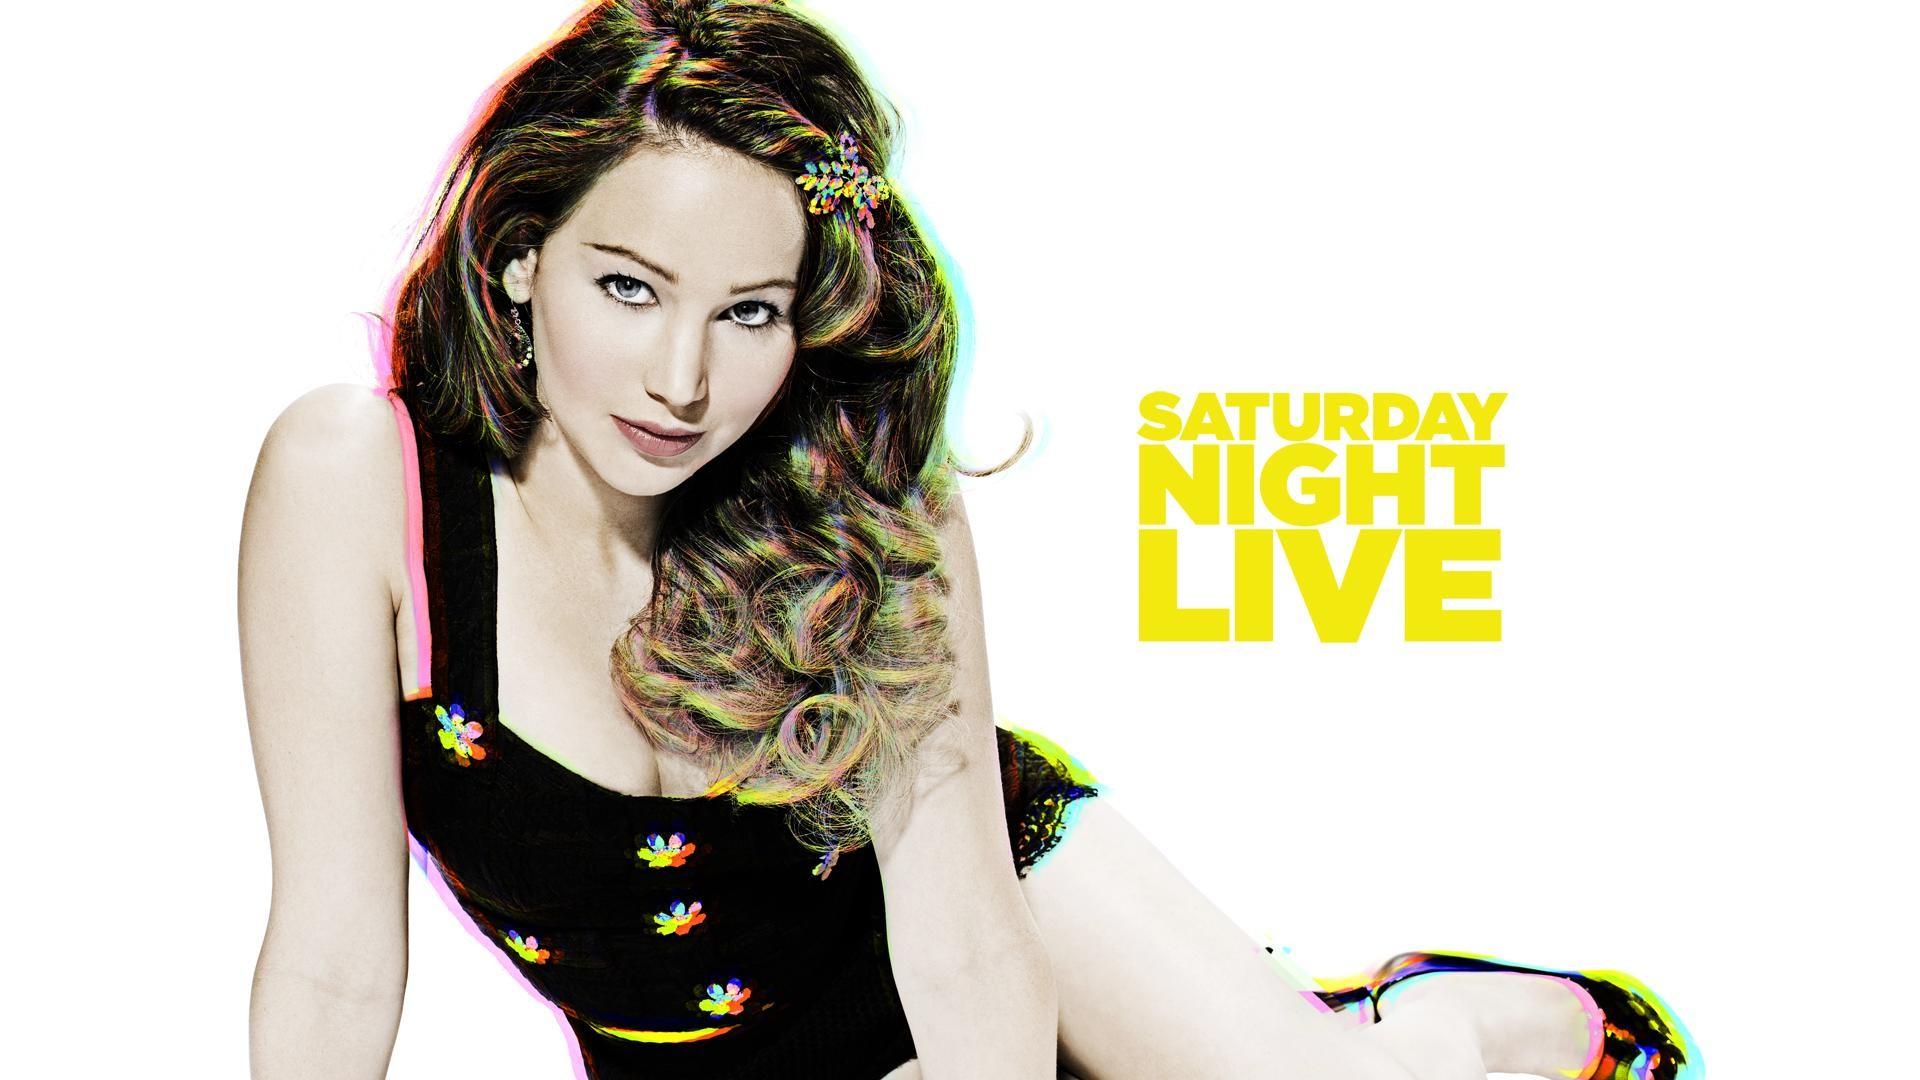 SNL Jennifer Lawrence Wallpaper HD